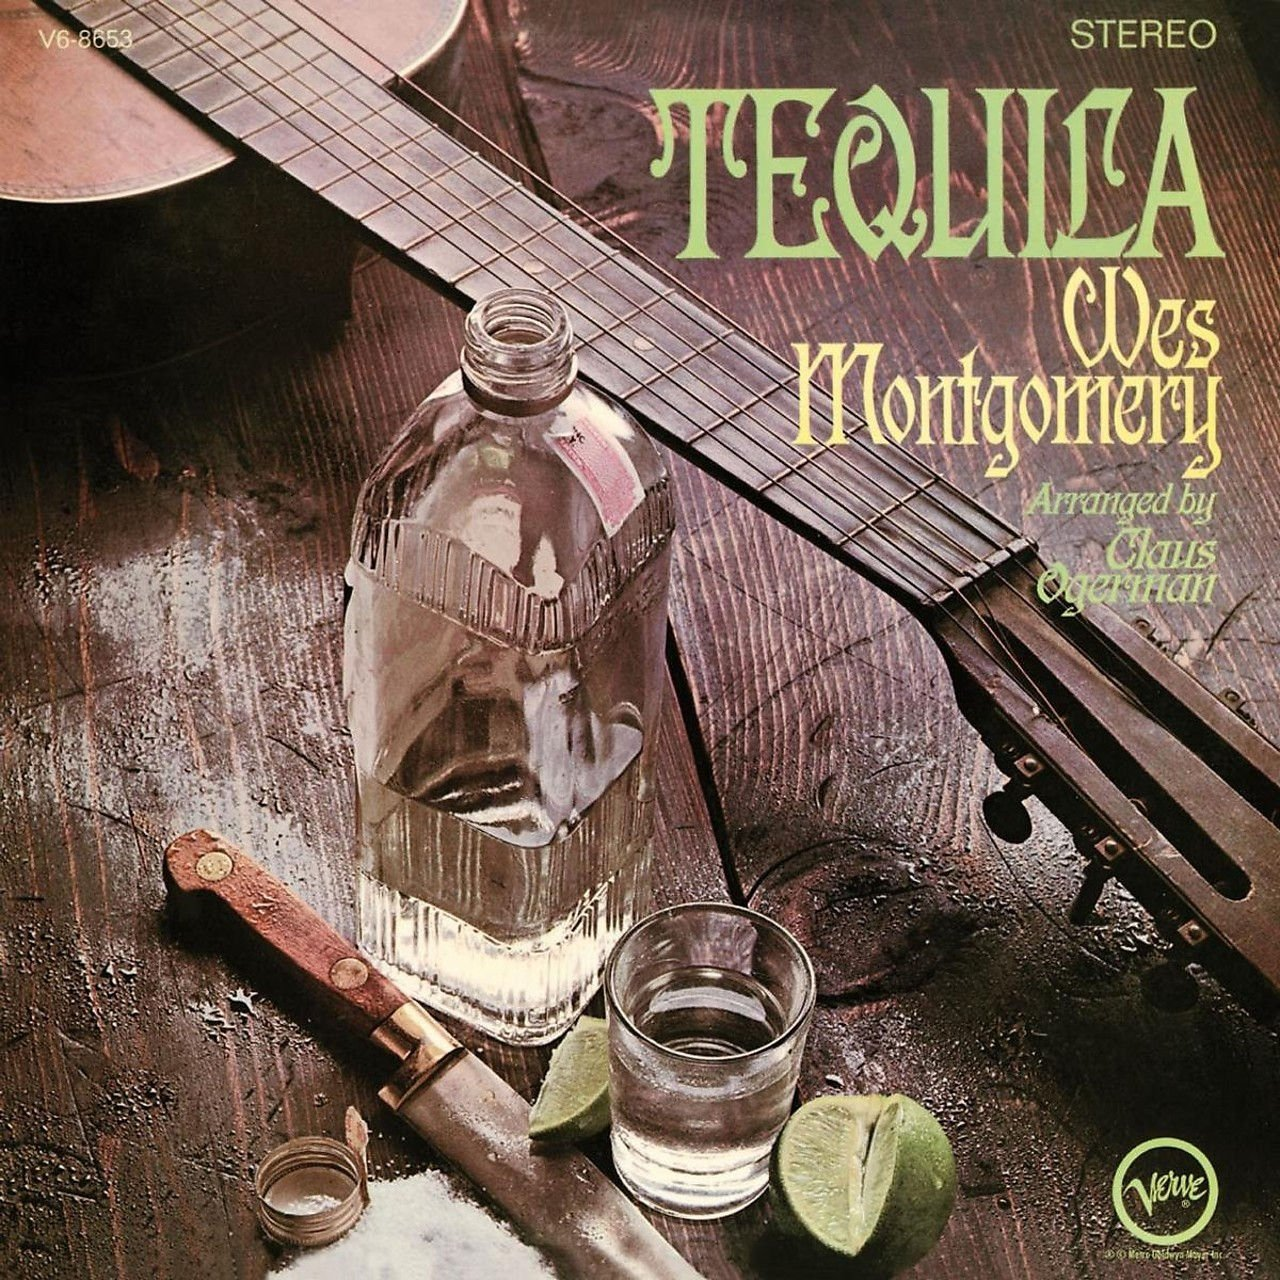 wes montgomery tequila album cover